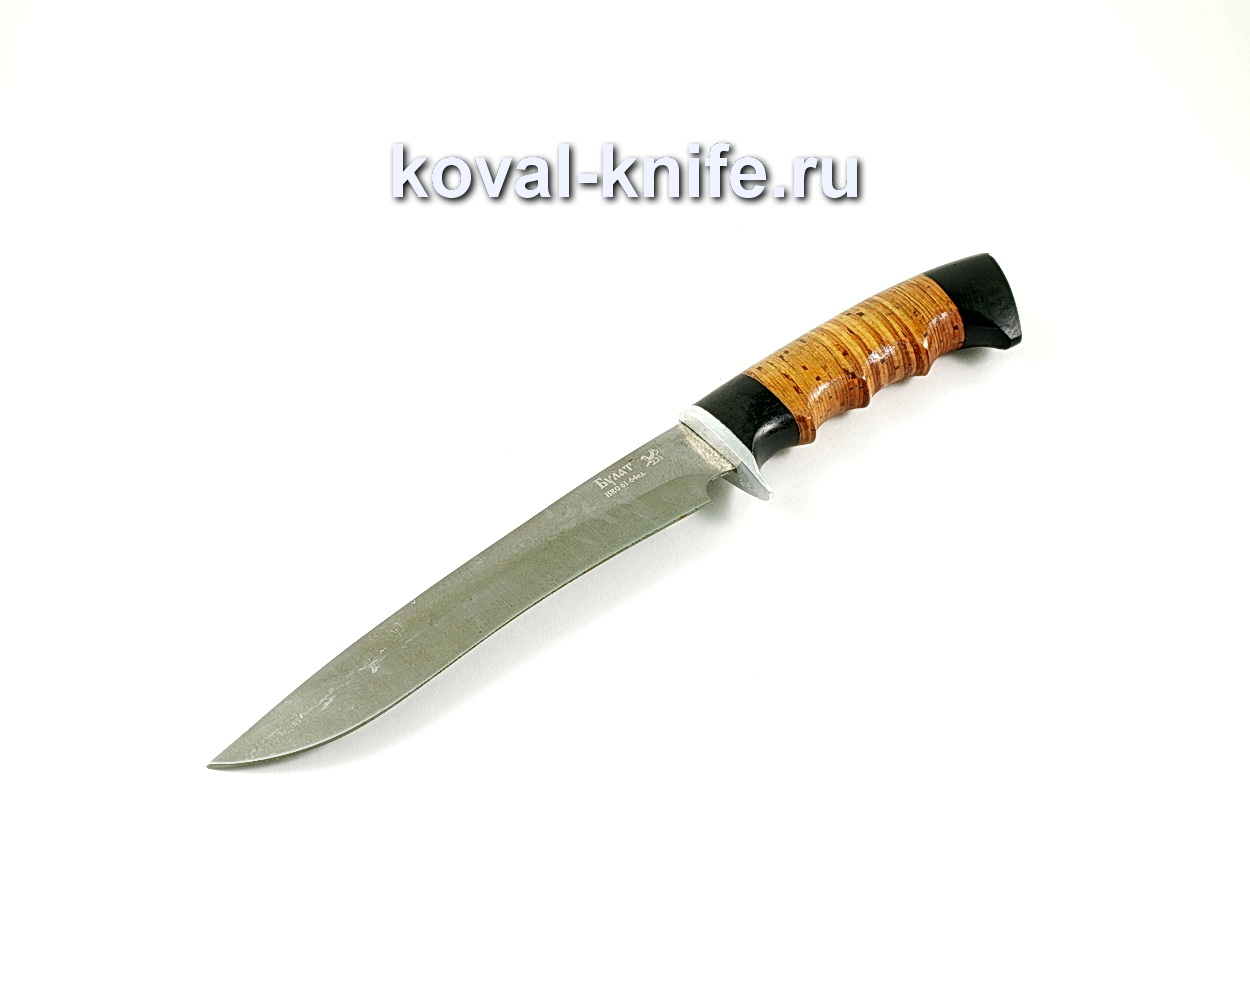 Нож «Свинорез» (сталь Булат), рукоять венге, береста A197